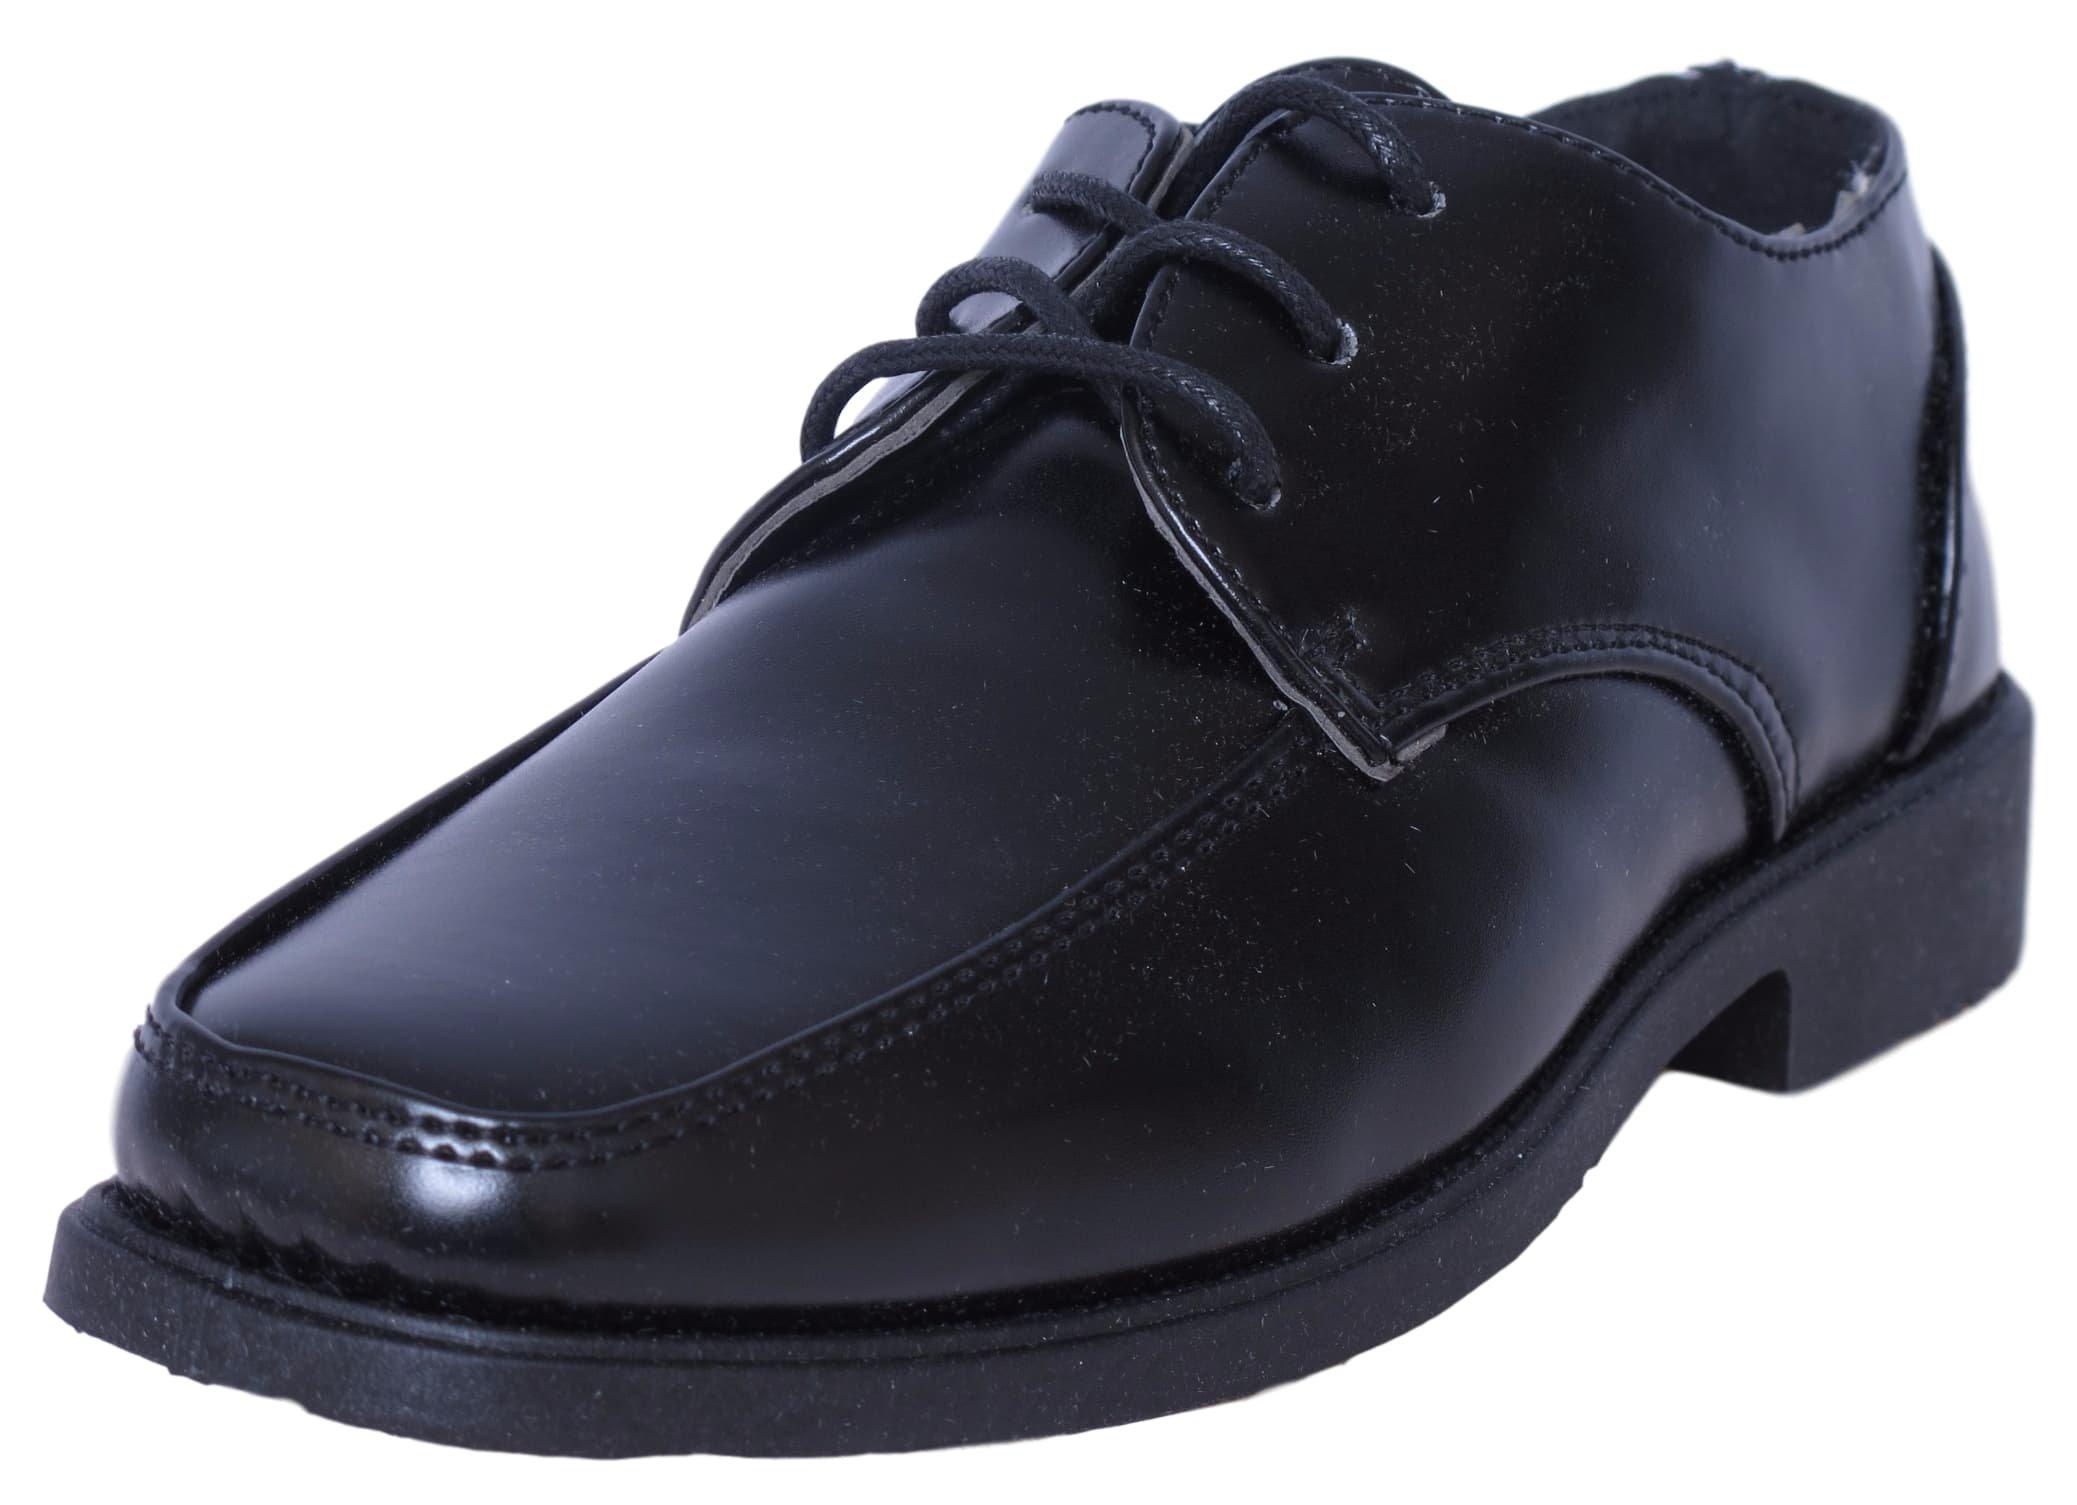 Josmo Boys Lace-up Dress Shoes, Black Size 1'